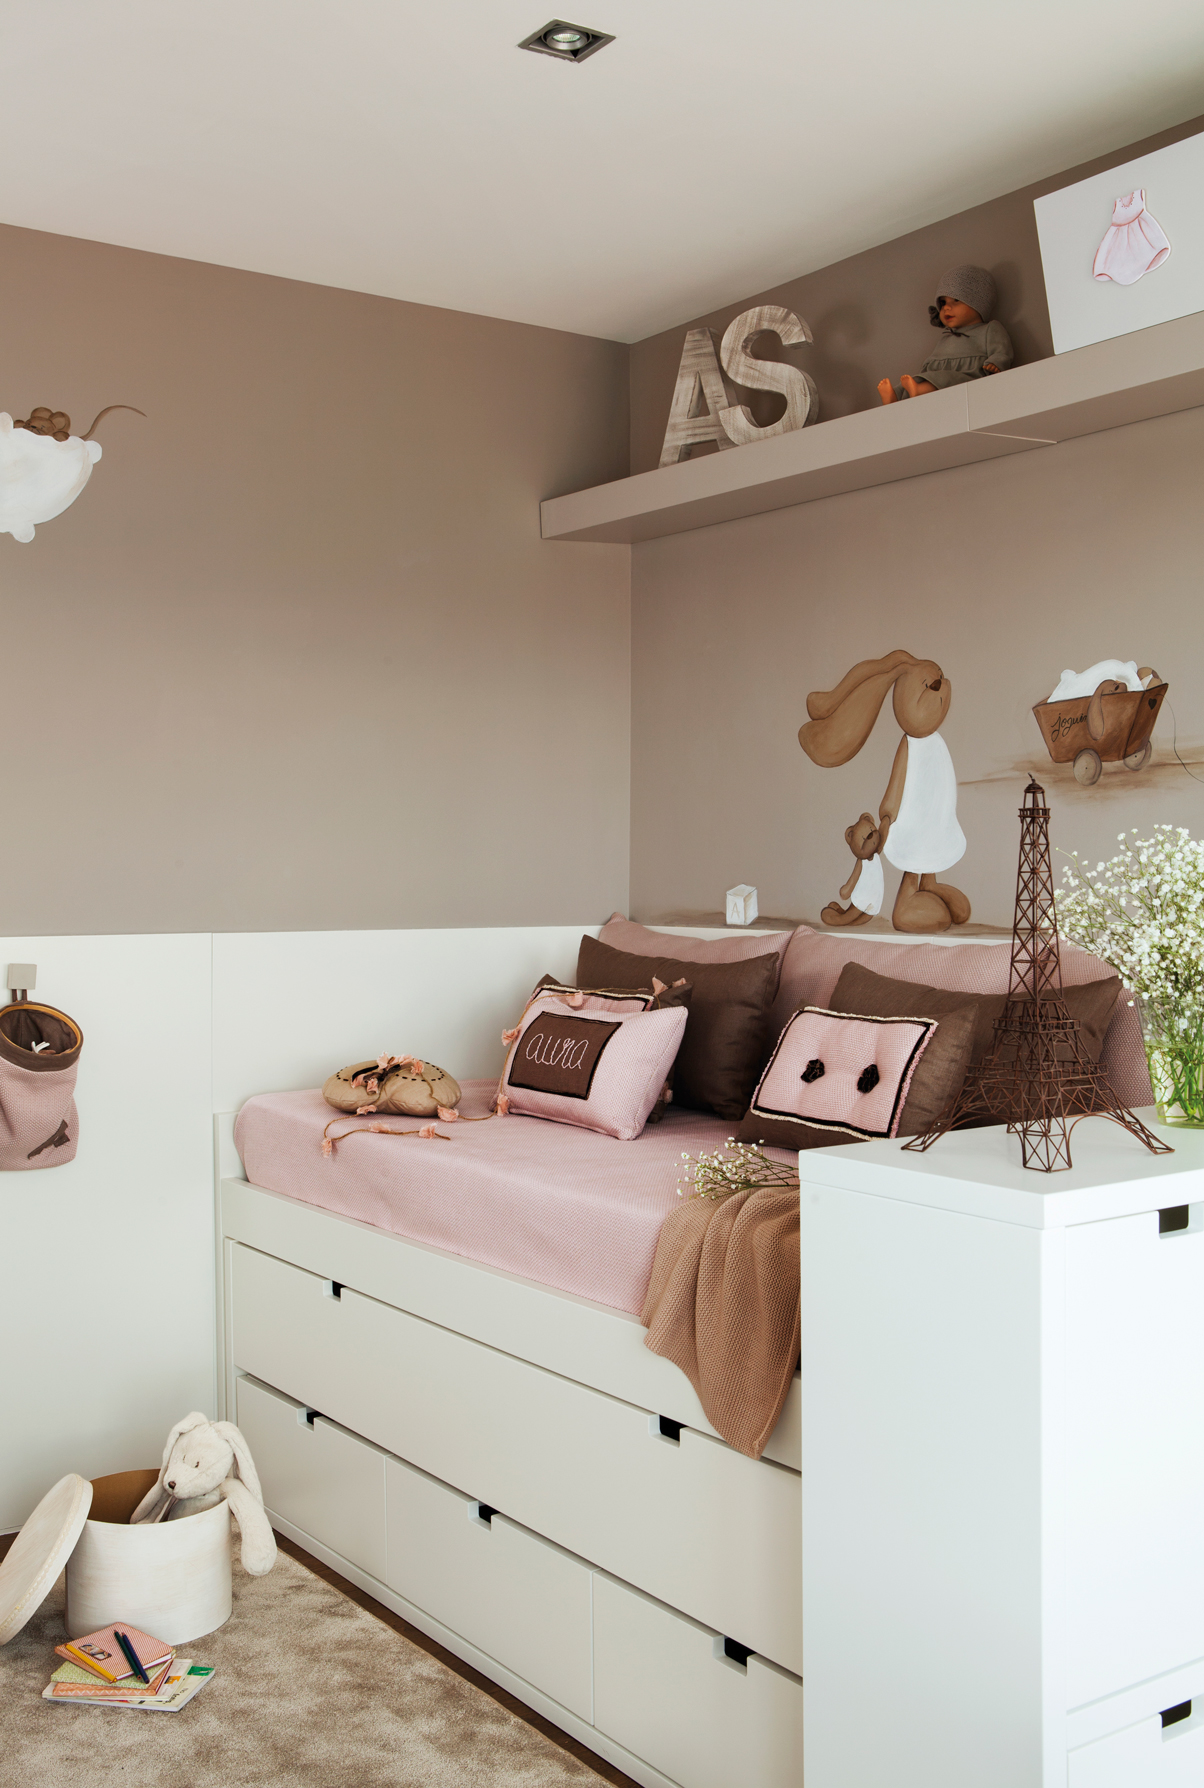 Cama infantil con cajones dormitorio infantil con cama - Cama nido blanca con cajones ...